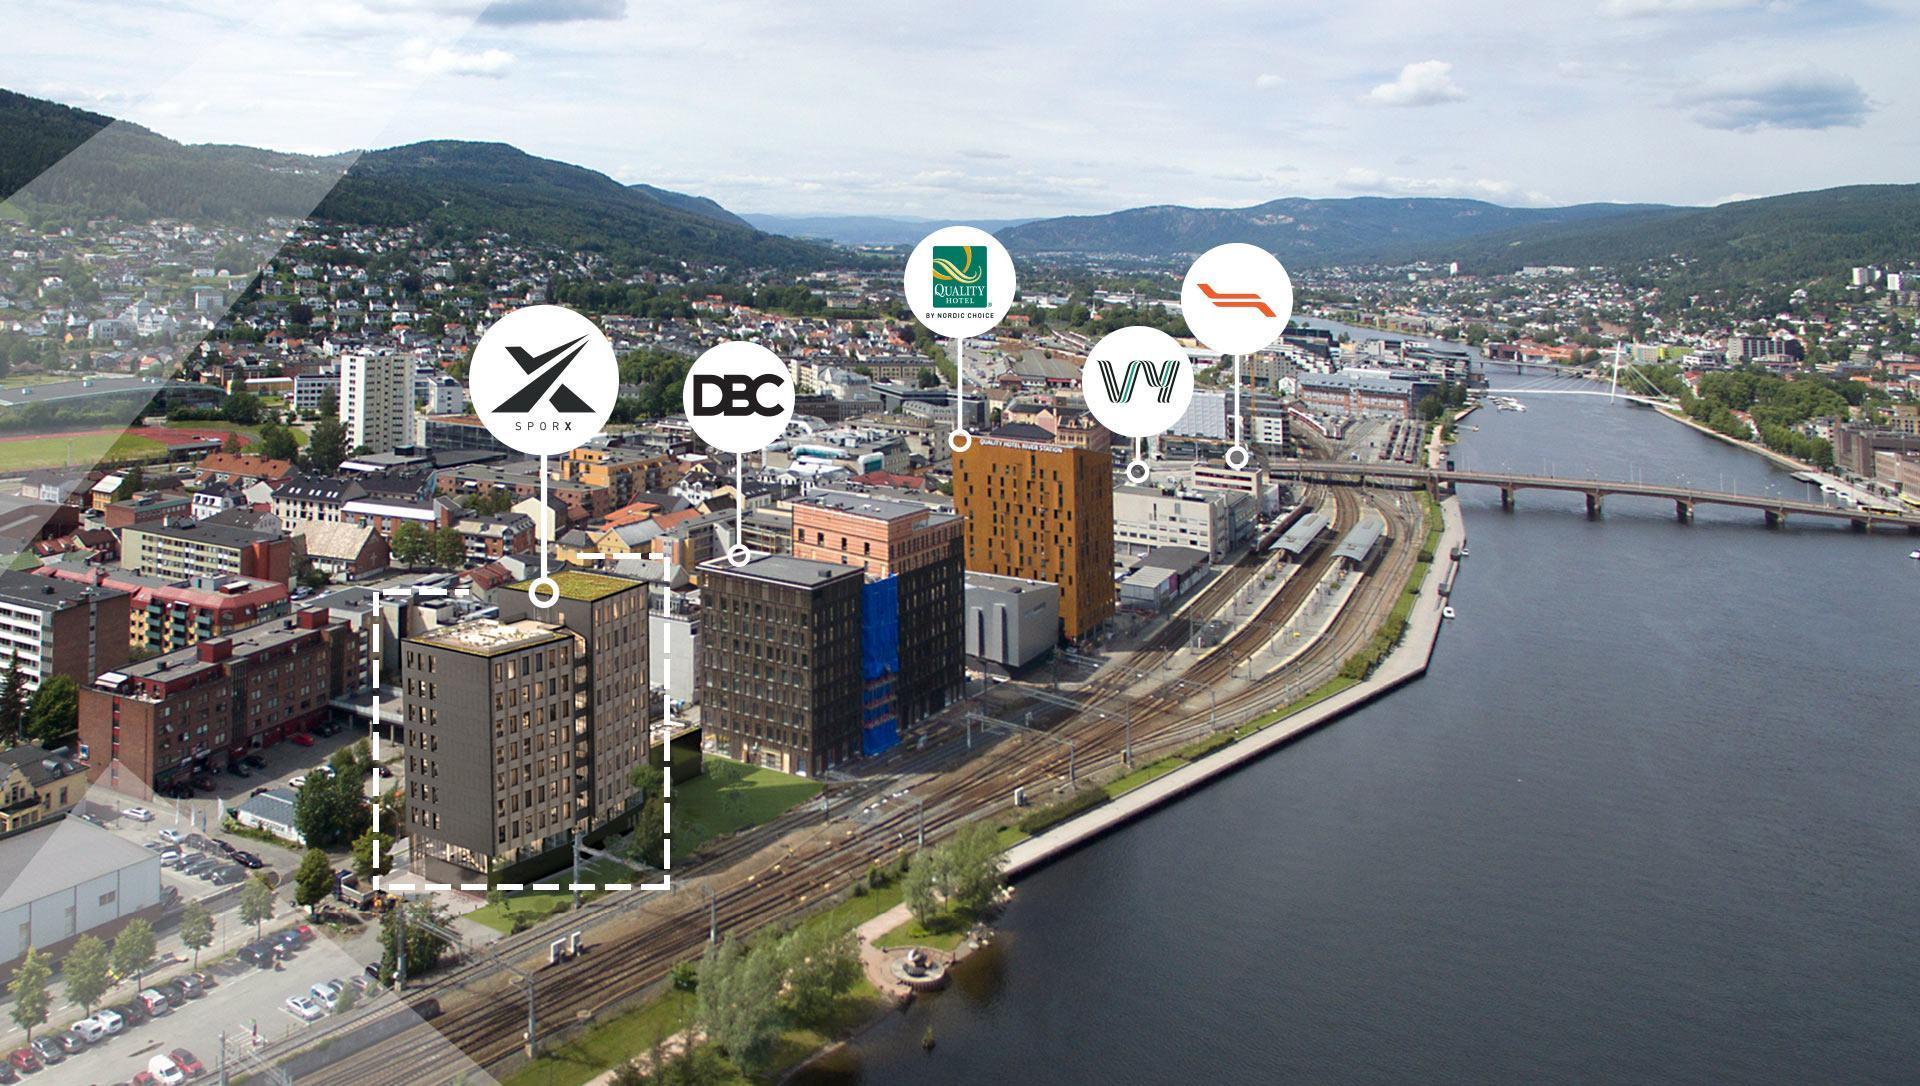 Drammen oversiktsbilde. Dronefoto